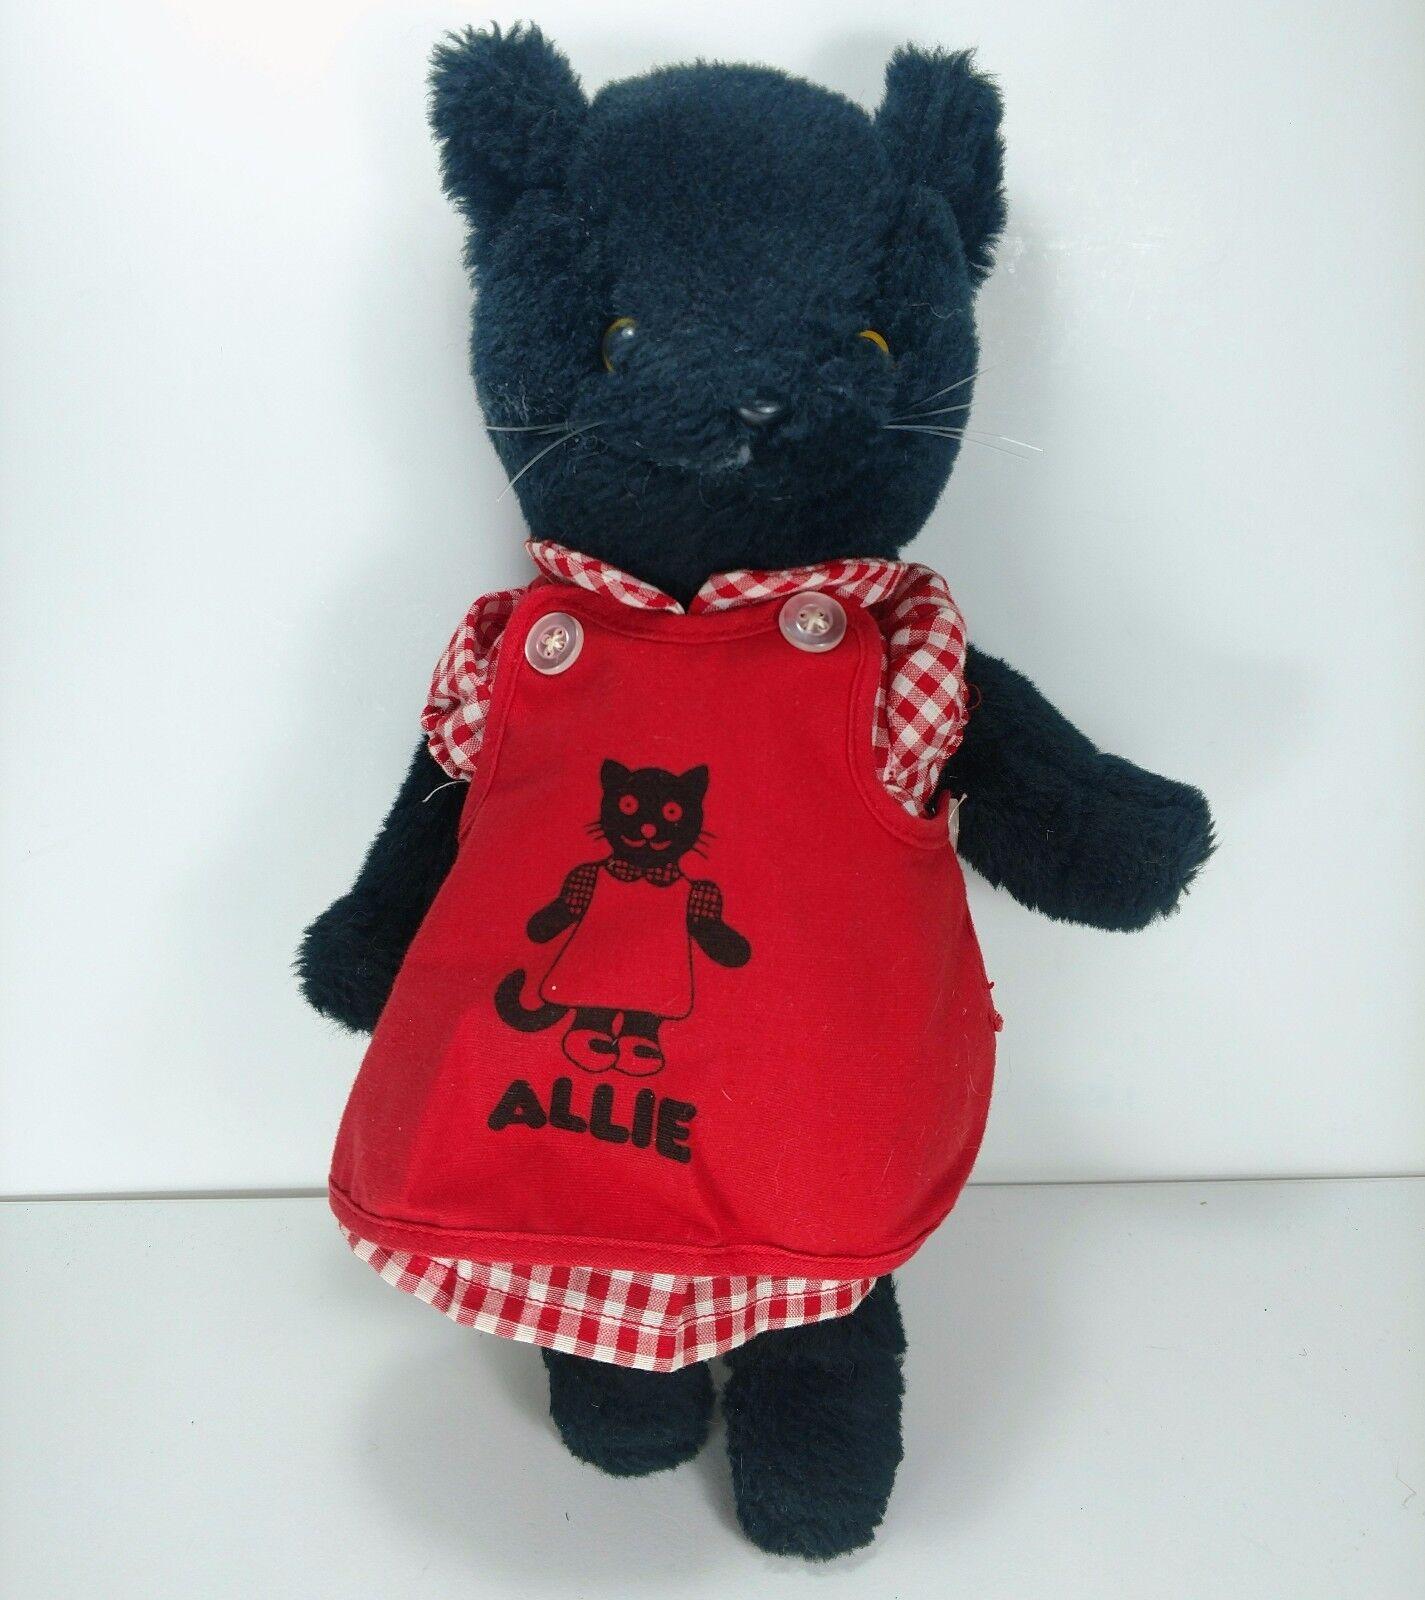 Vintage SS Happiness Crew Allie Cat Plush Plush Plush 11  Stuffed Kitten 1979 June Dutton 005104